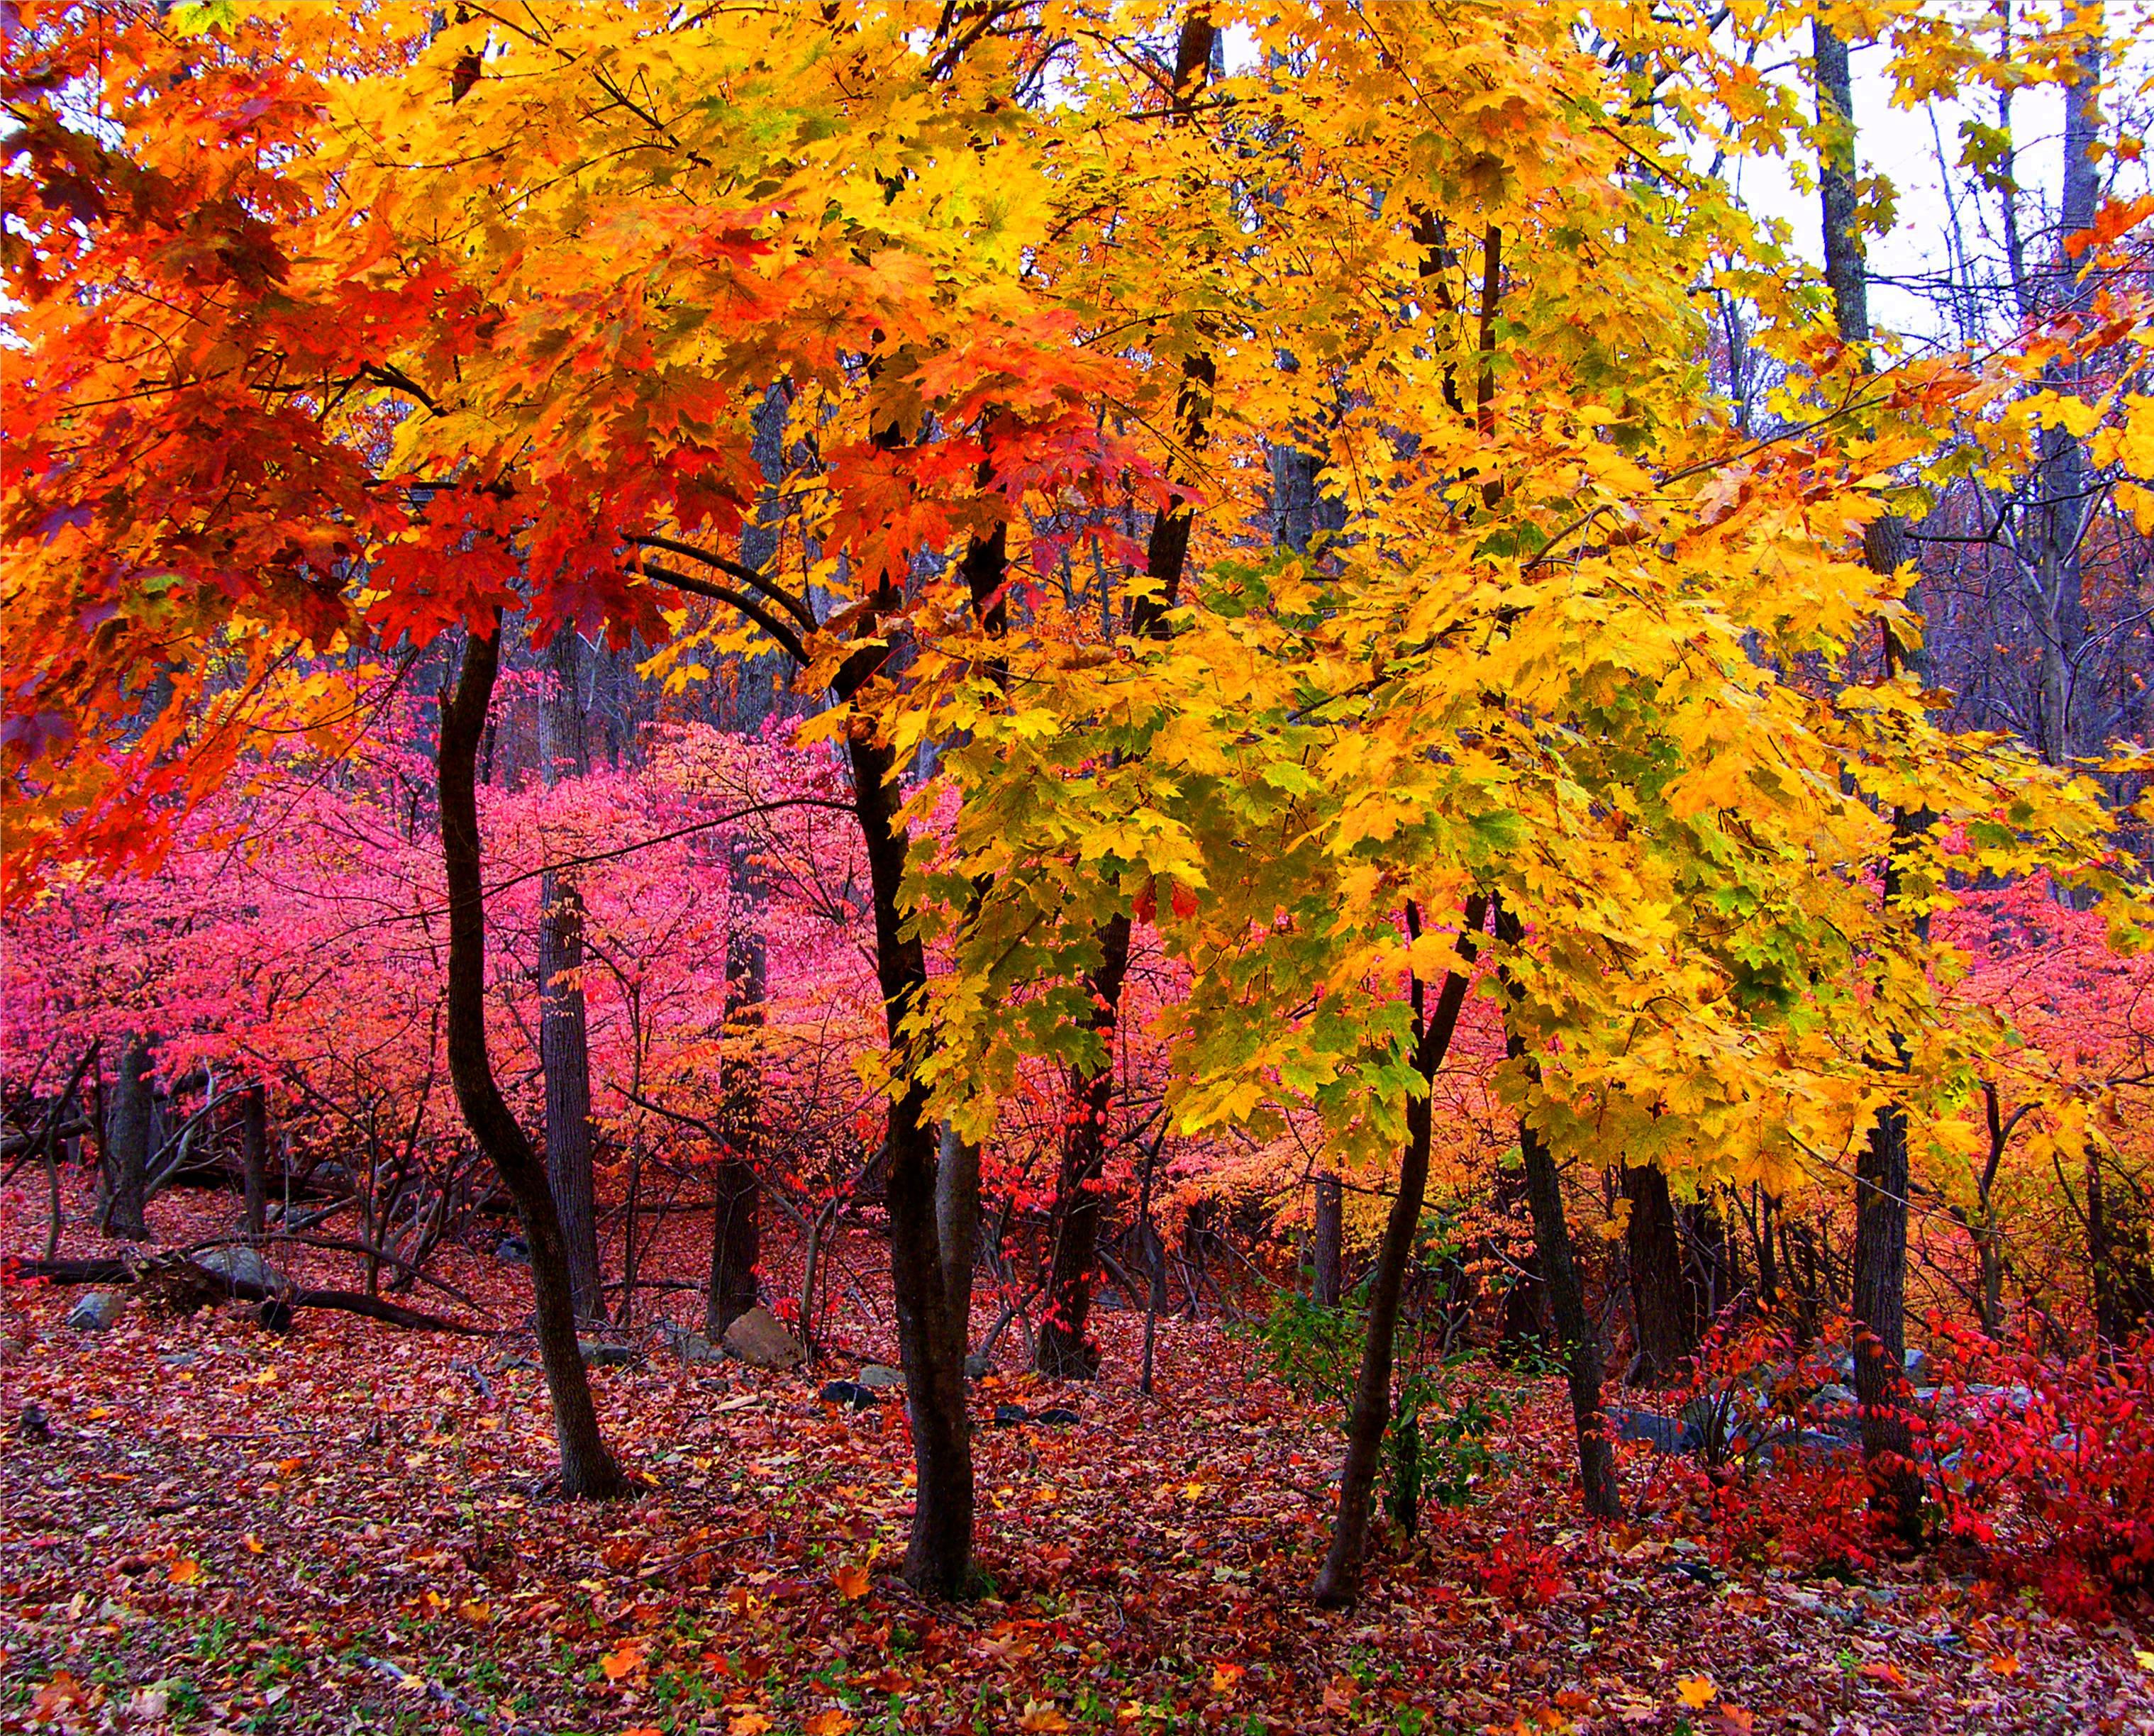 hintergrundbilder park rosa herbst b ume baum fallen natur farben bl tter gelb. Black Bedroom Furniture Sets. Home Design Ideas